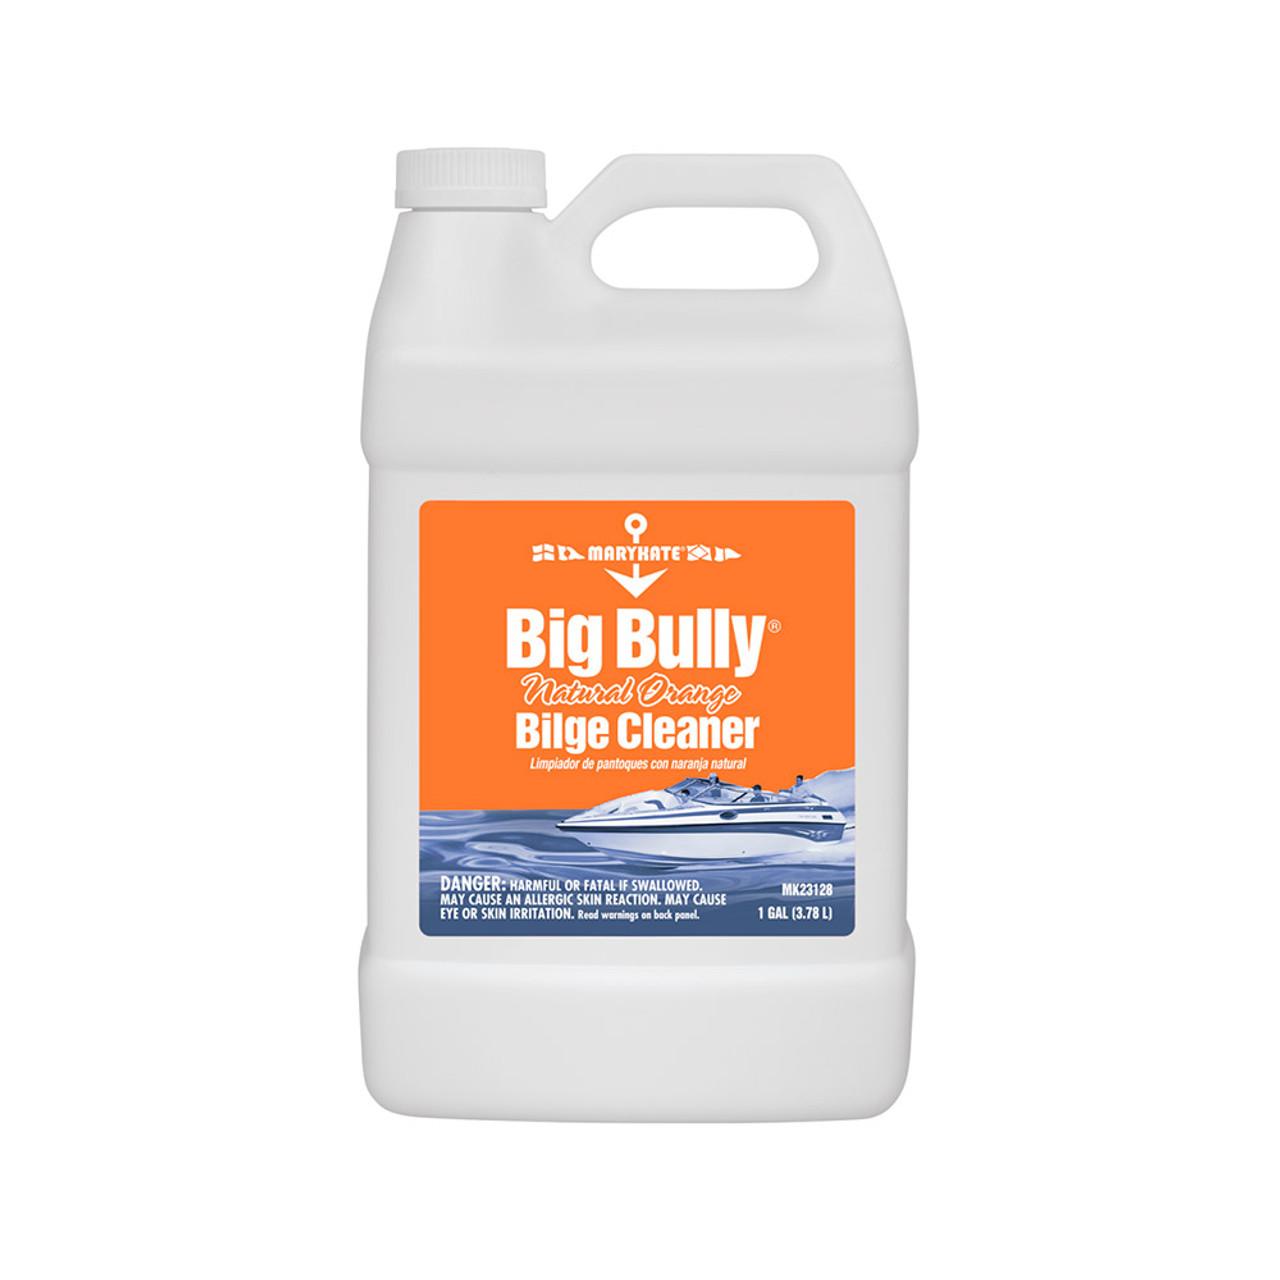 MARYKATE Big Bully Natural Orange Bilge Cleaner - 1 Gallon - #MK23128